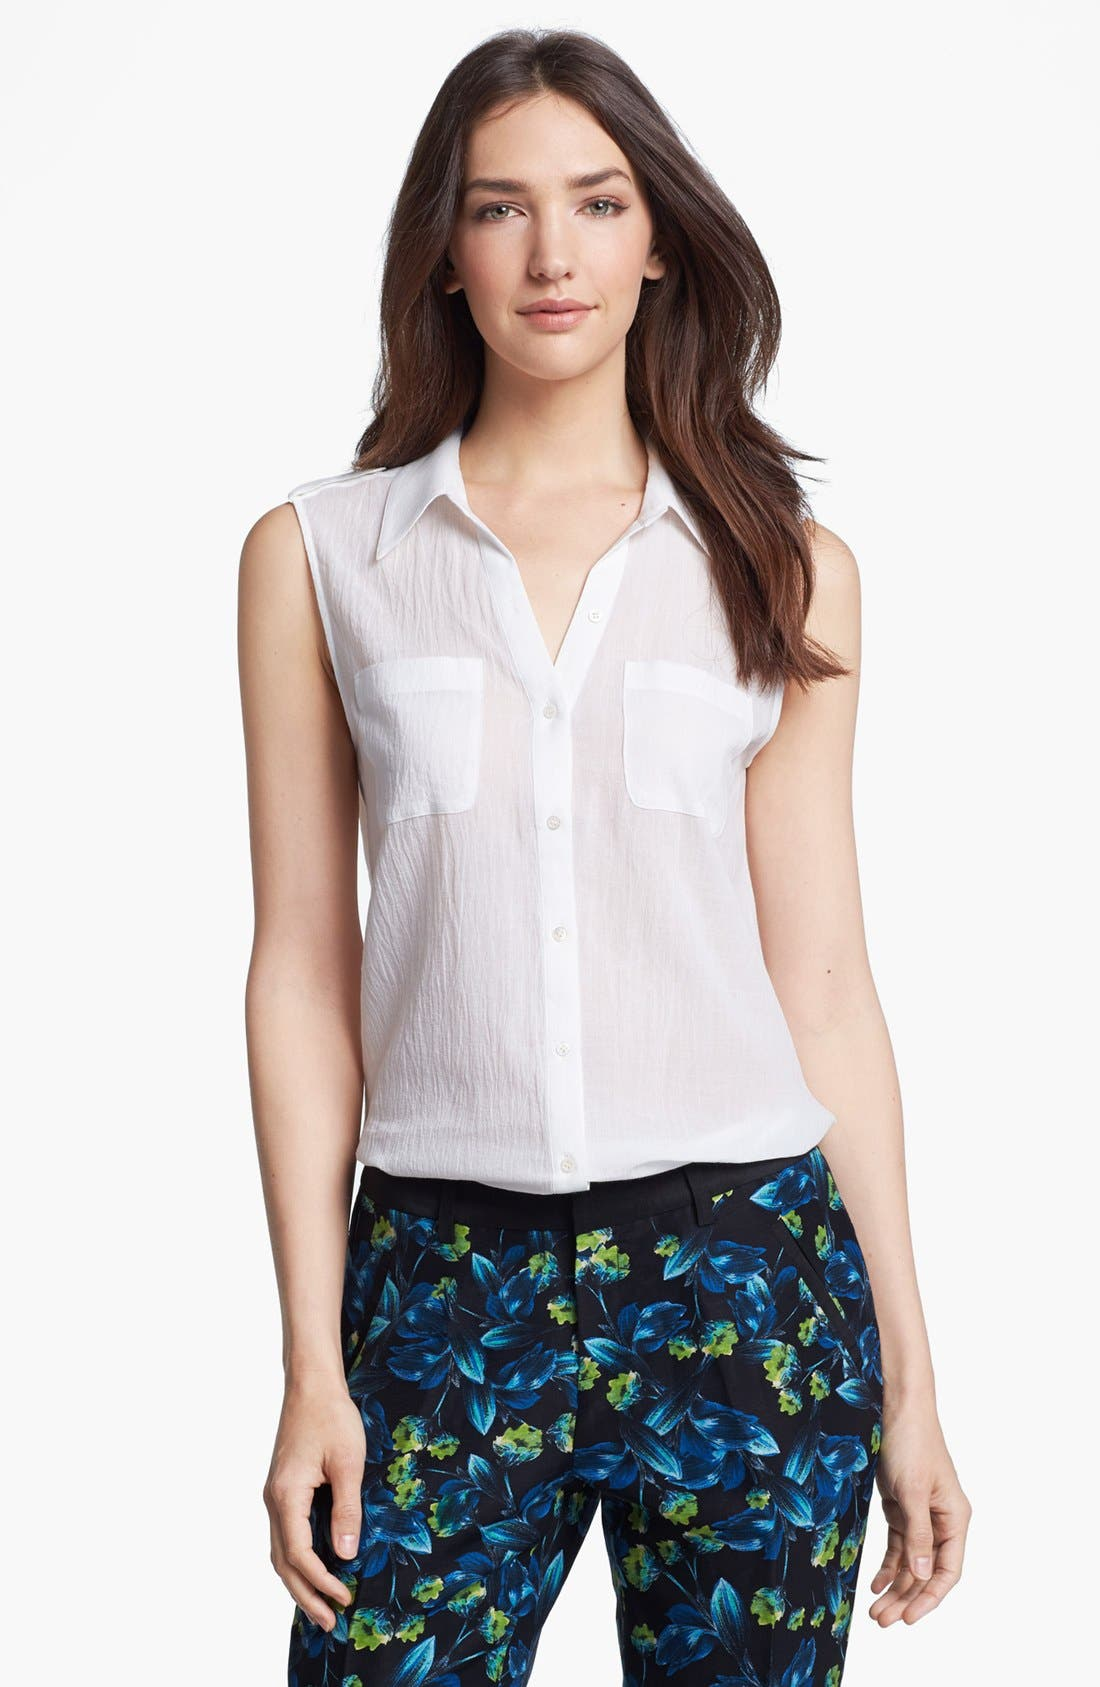 JOIE 'Philana' Shirt, Main, color, 114